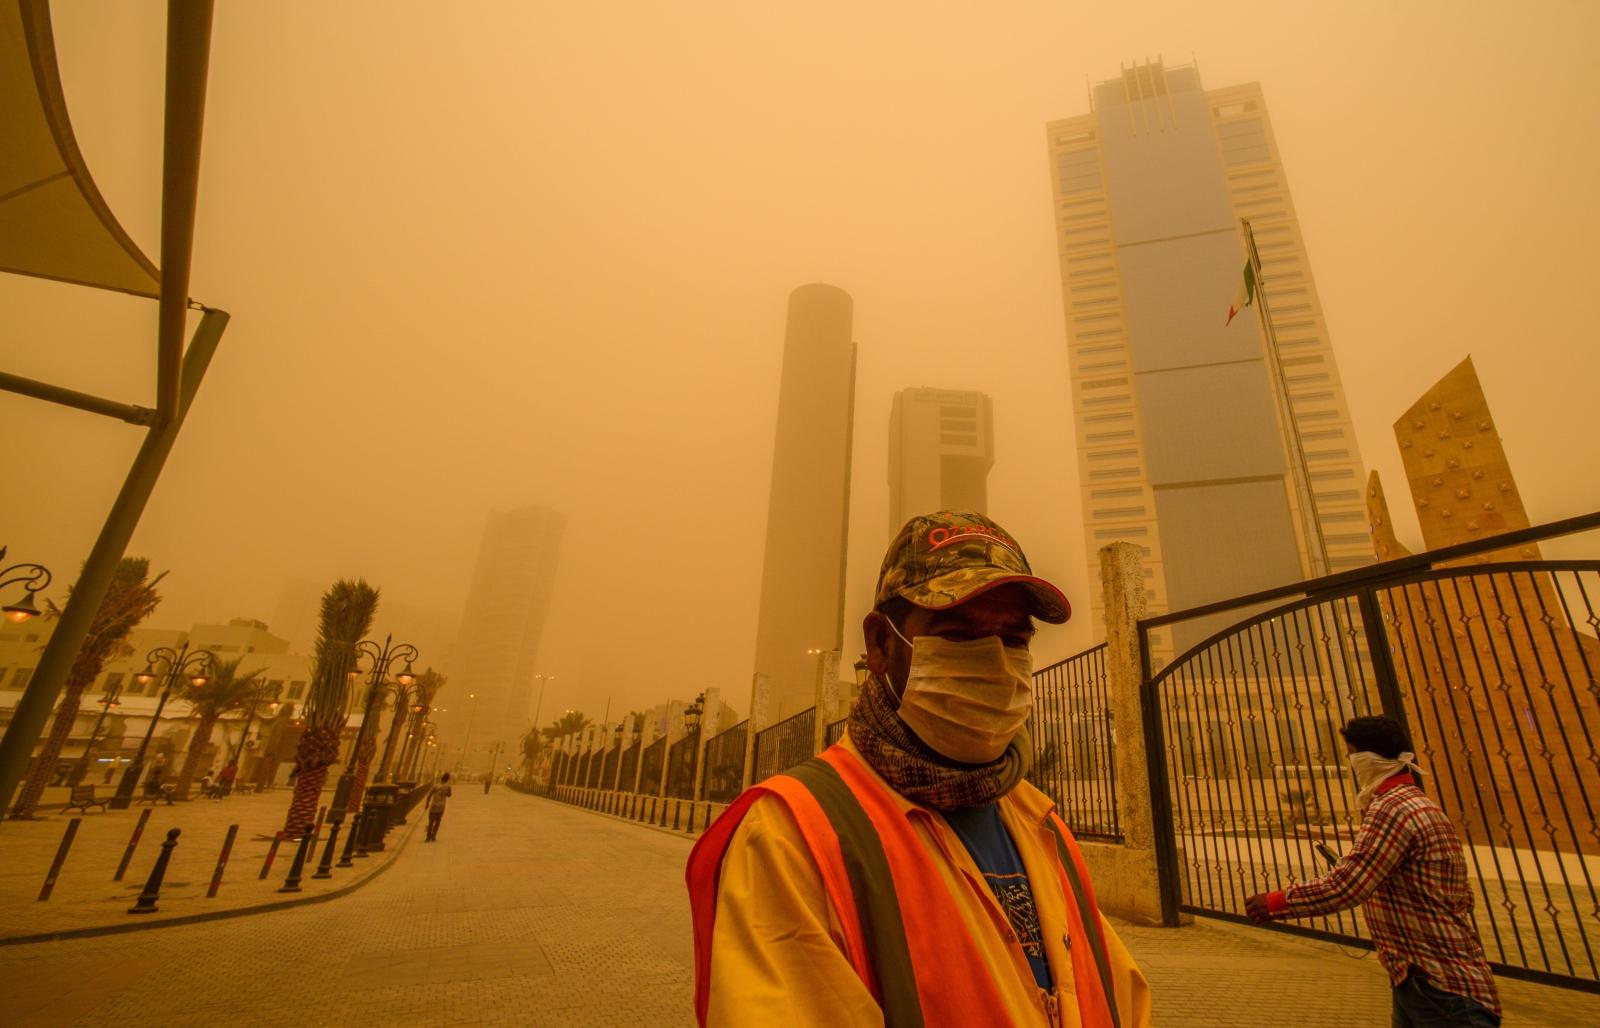 Burza piaskowa w Kuwejcie. Fot. PAP/EPA/RAED QUTENA